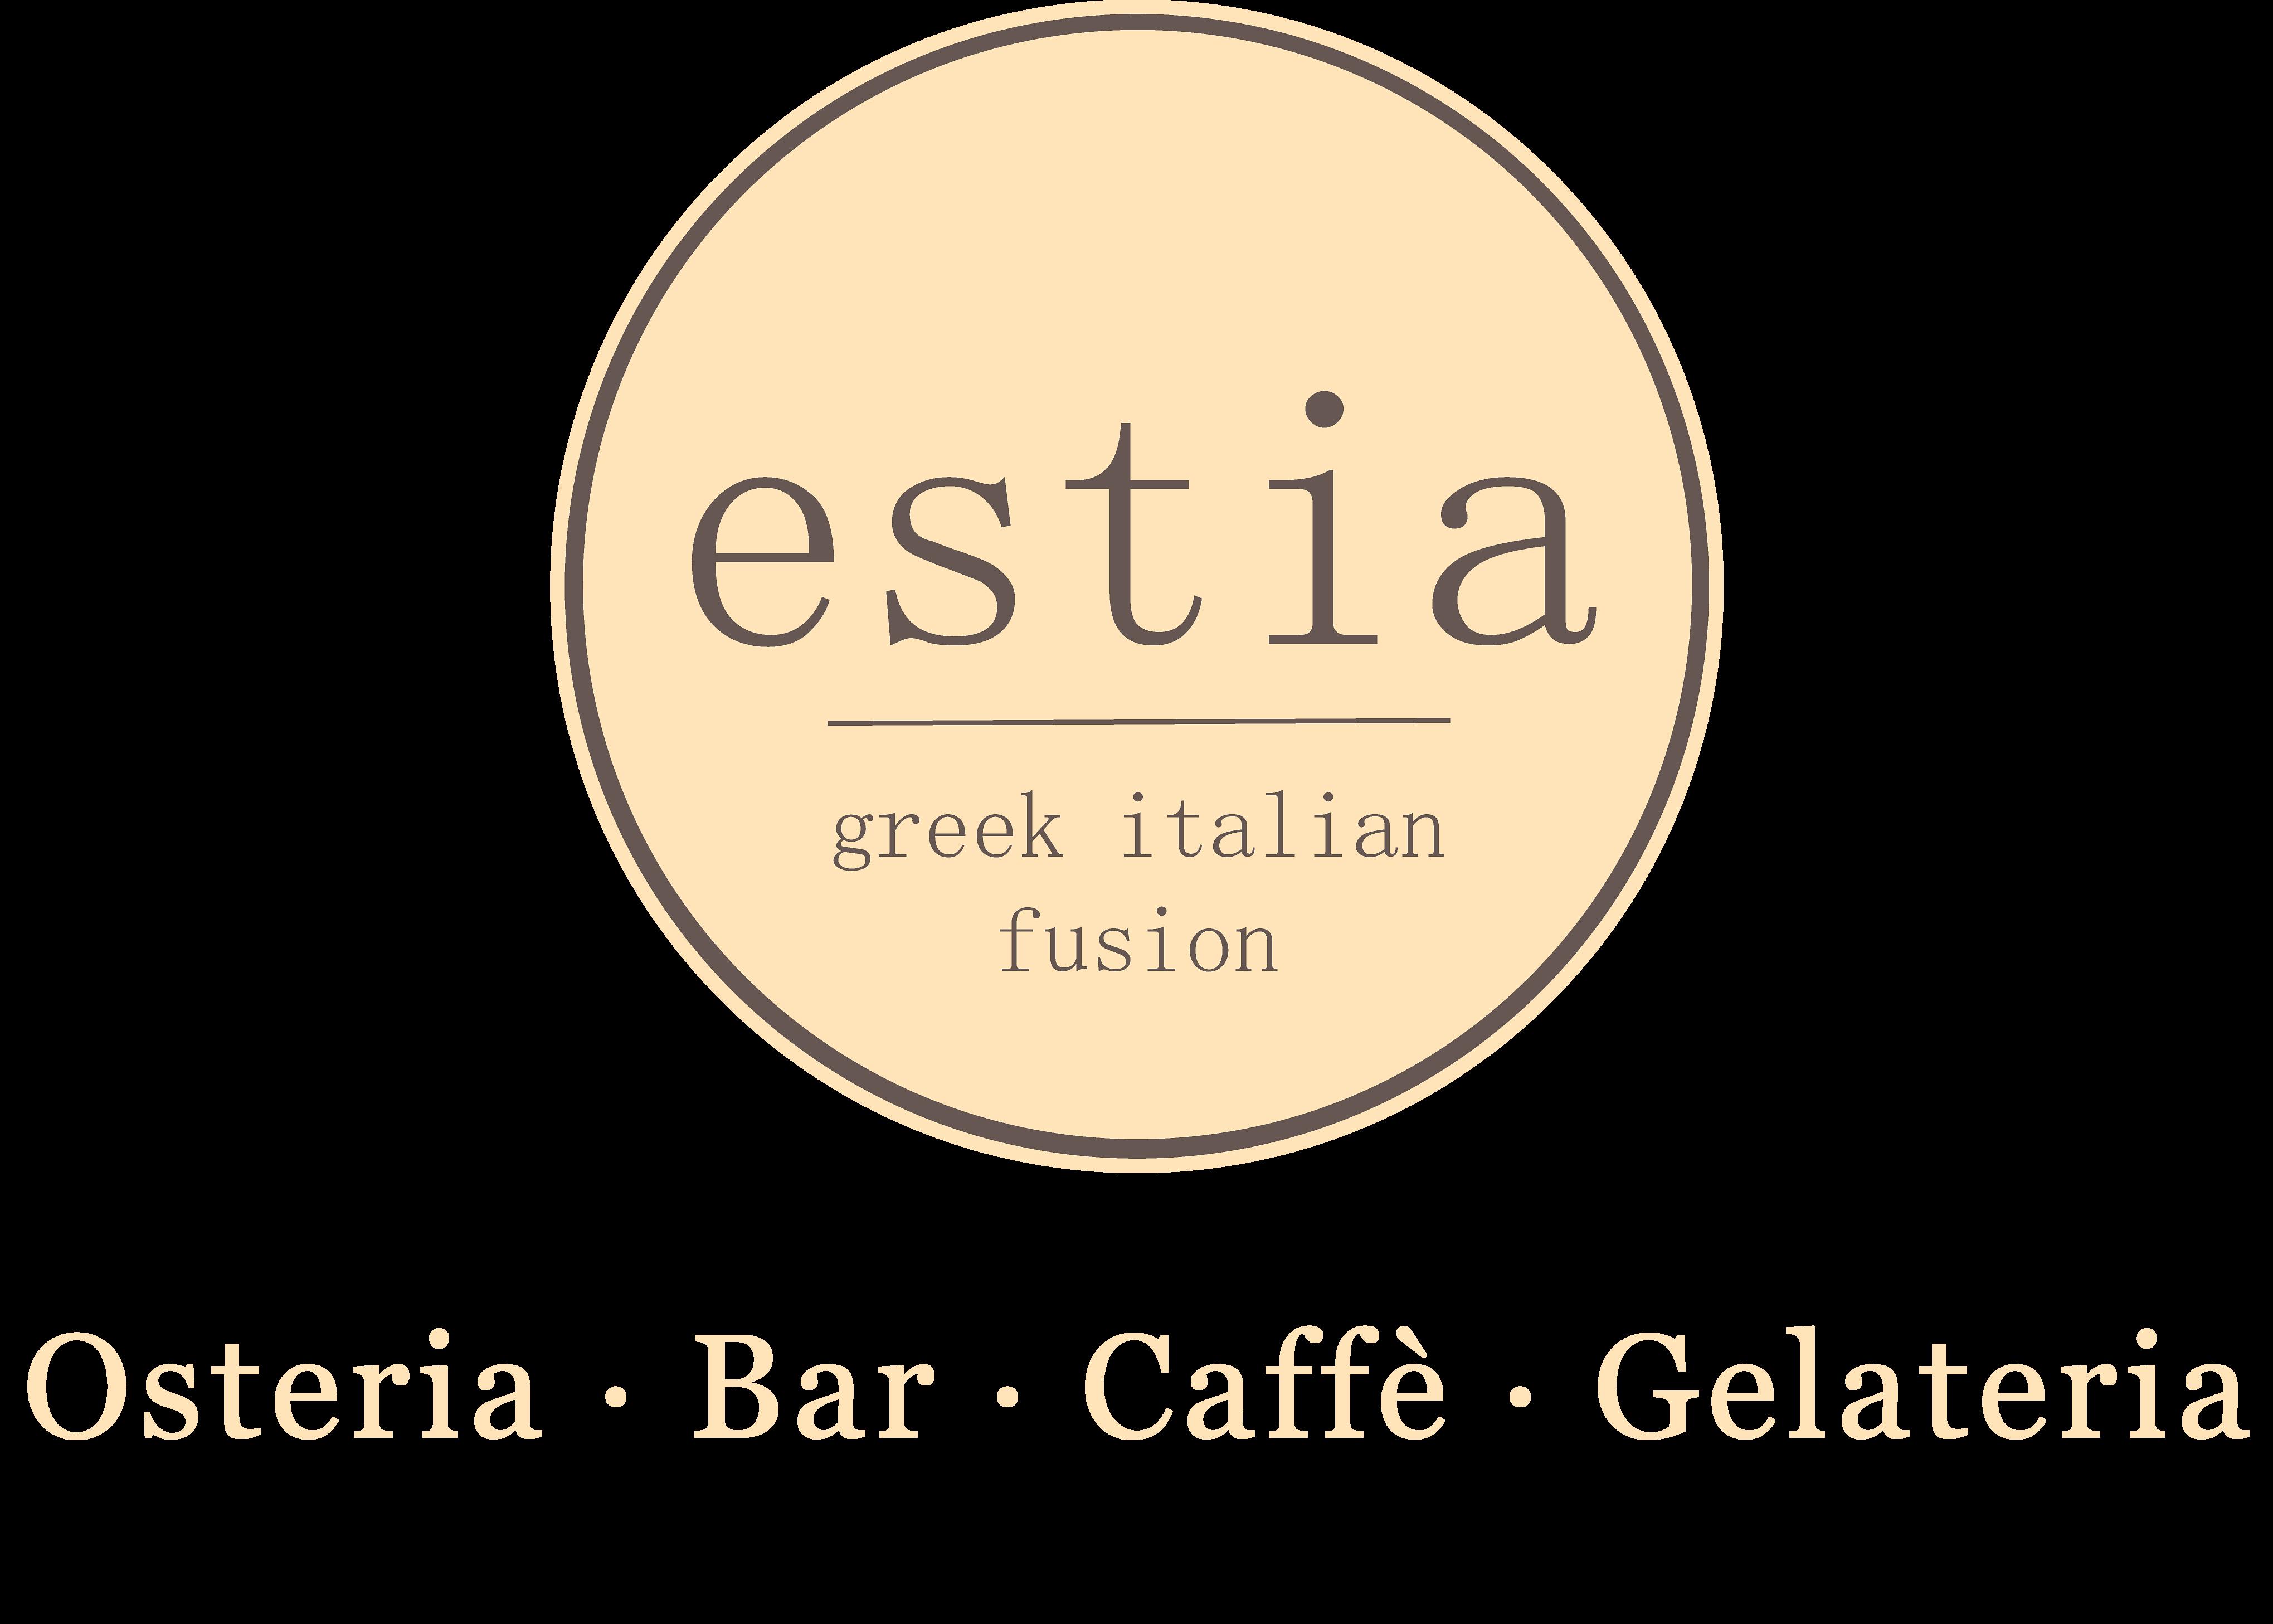 Osteria Estia